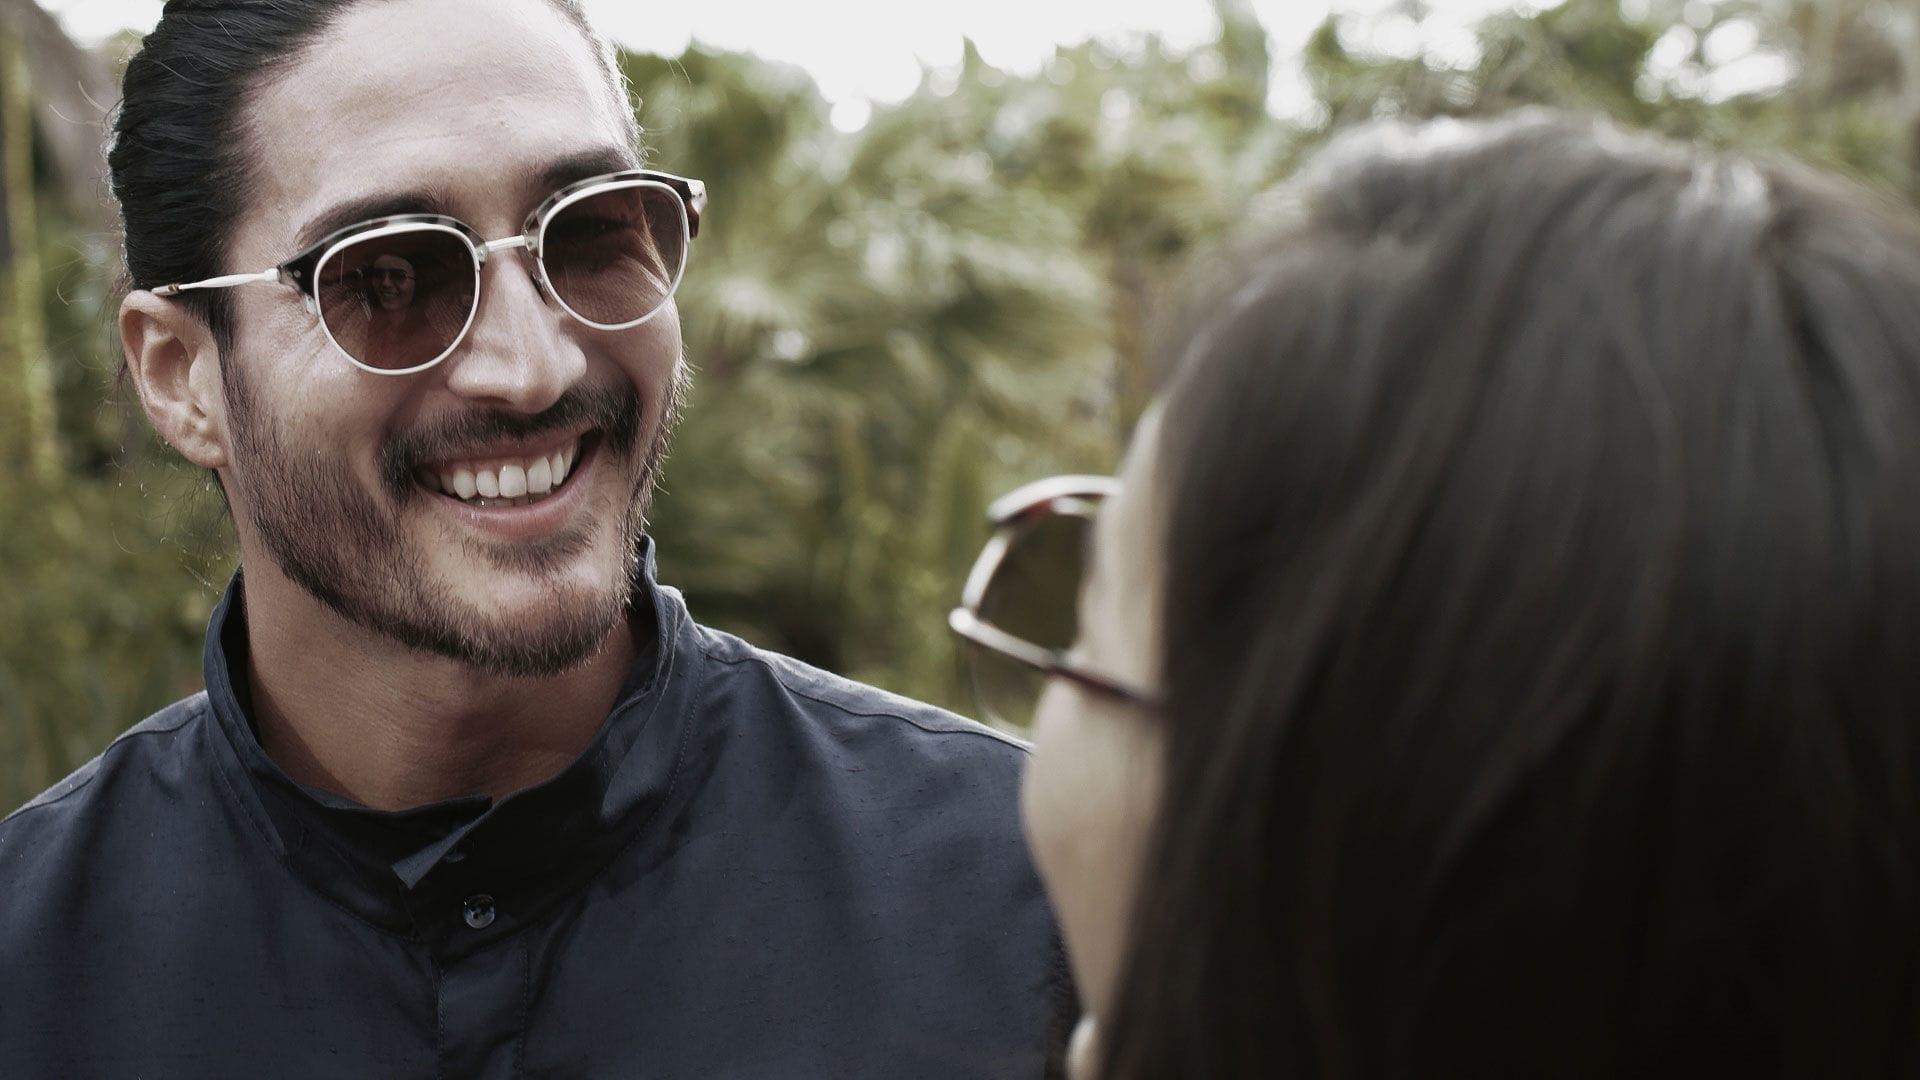 Giorgio_Armani_Eyewear_FW18_Santa_Ibiza_04.jpg